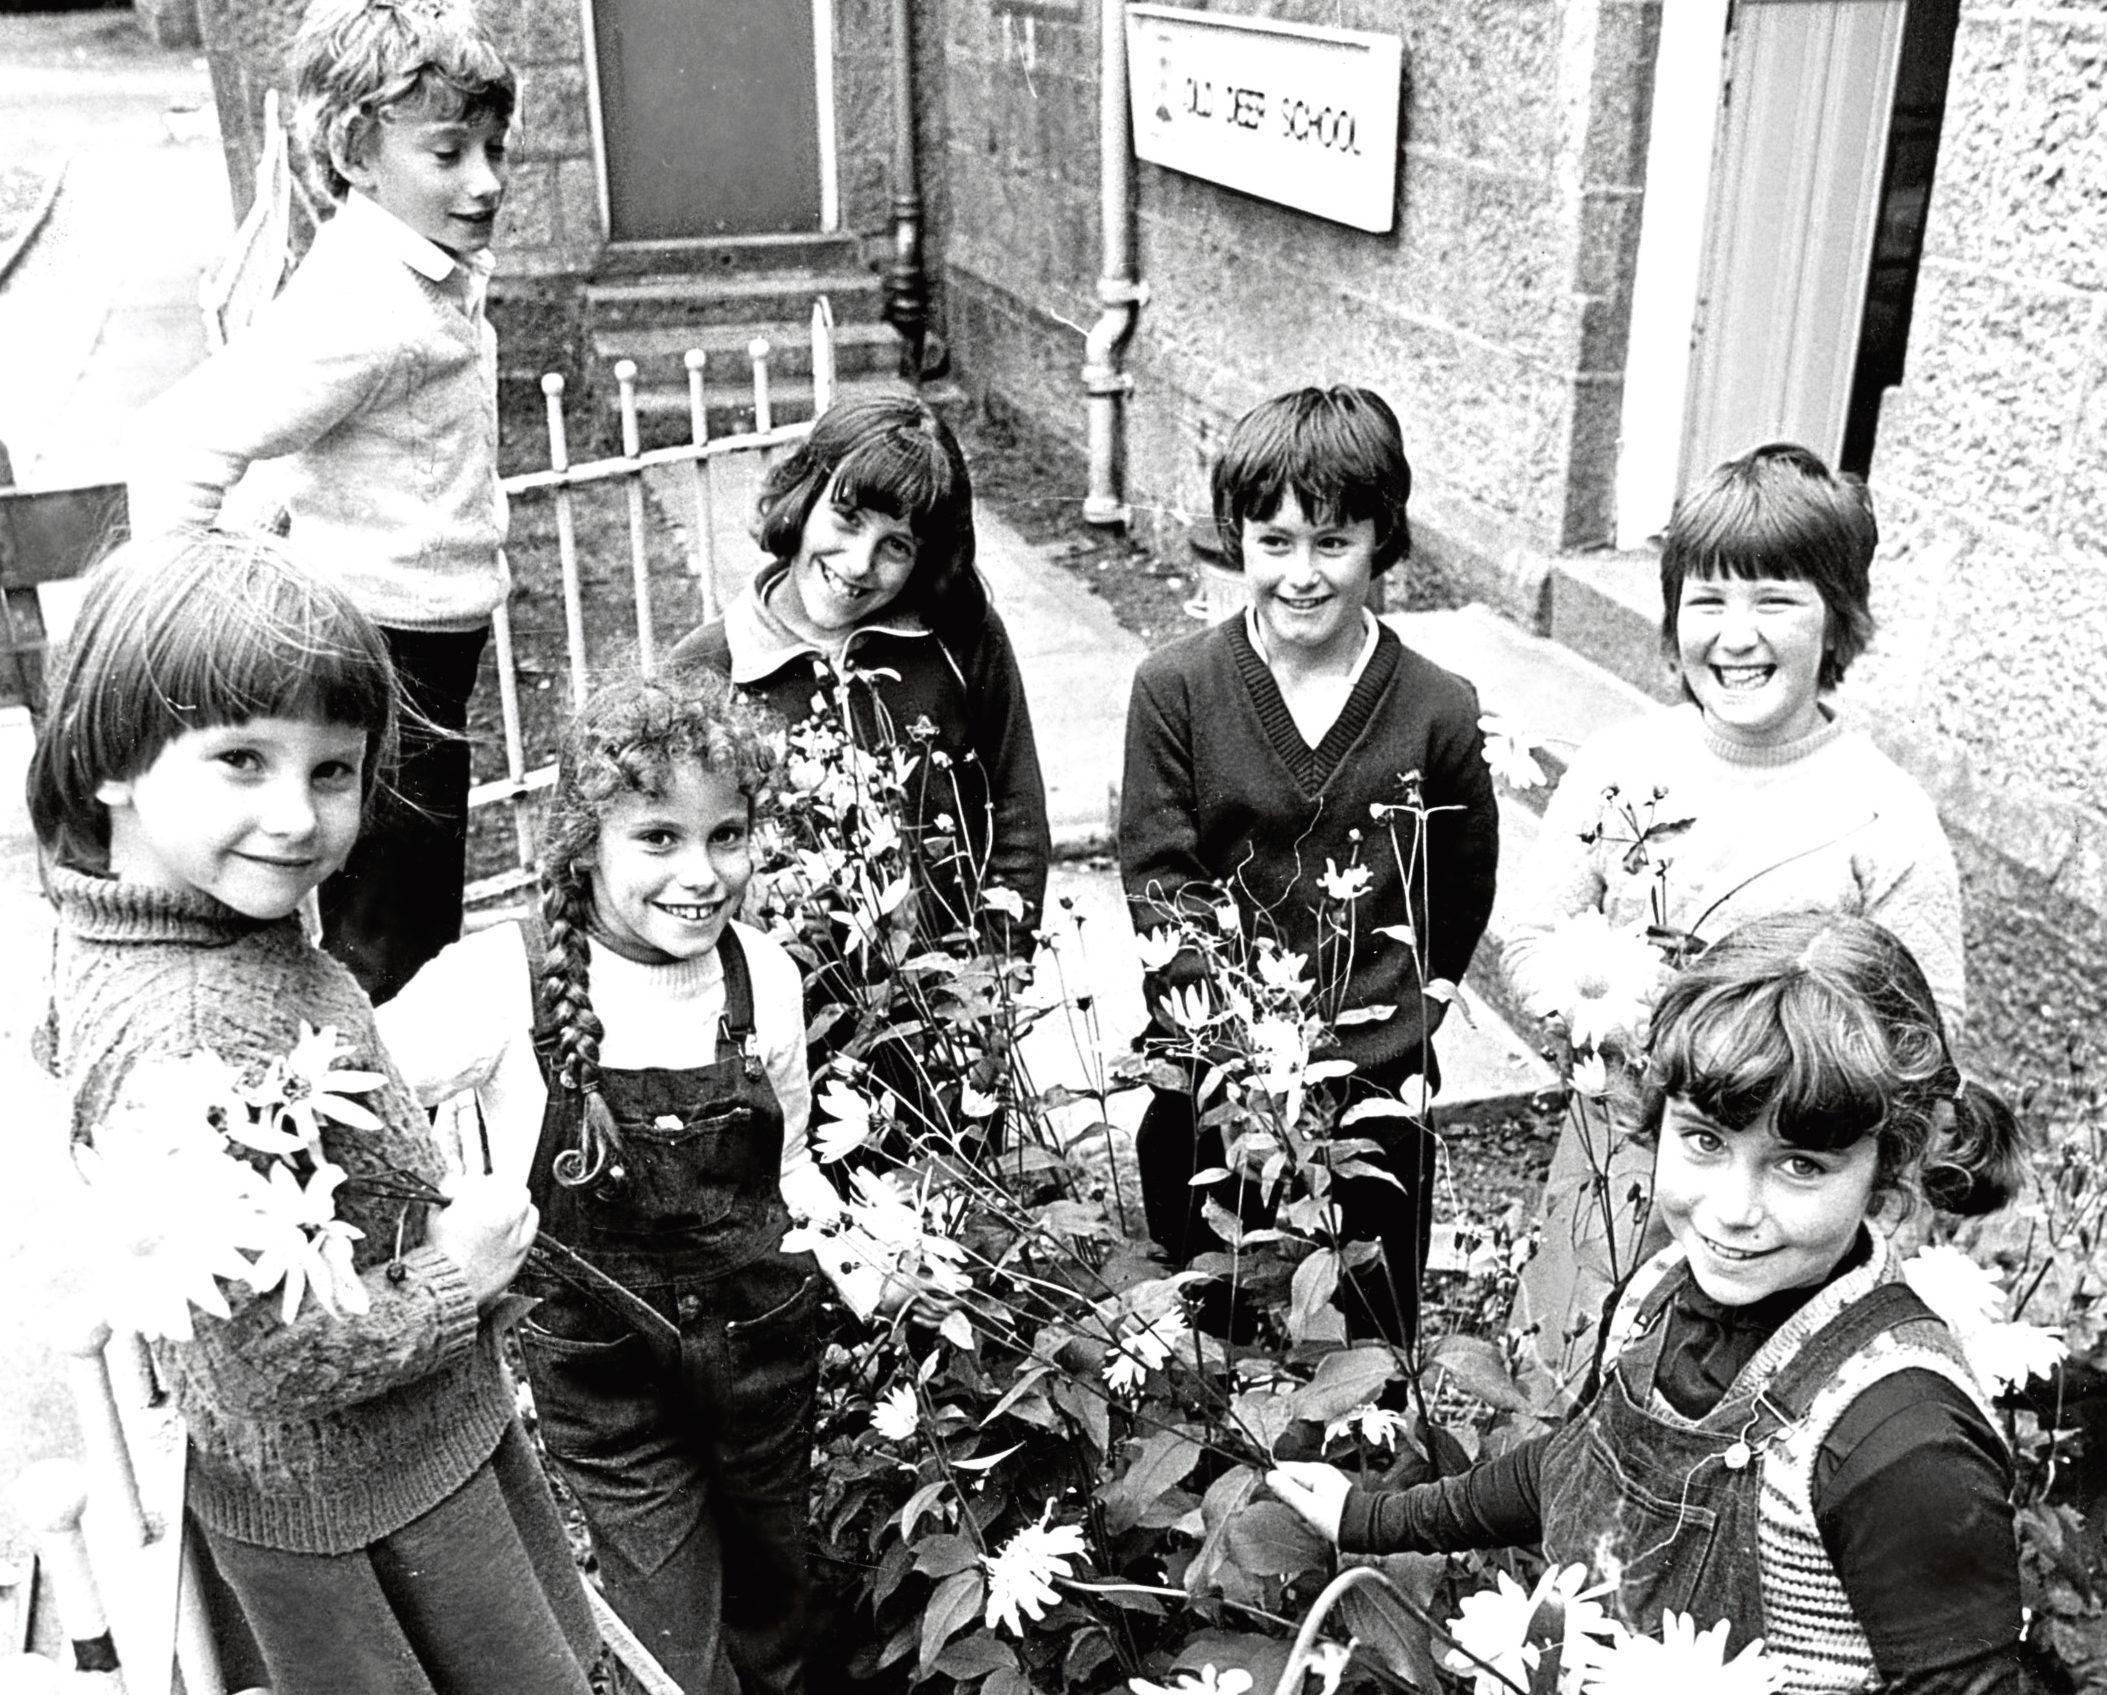 1981: The children picking flowers are Ann Campbell, 5, Mark Cruickshank, 11, Mary Bovey, 9, Janet Bovey, 10, Stephen Anderson, 11, Deborah Adamson, 10, and Alison Bovey, 9.